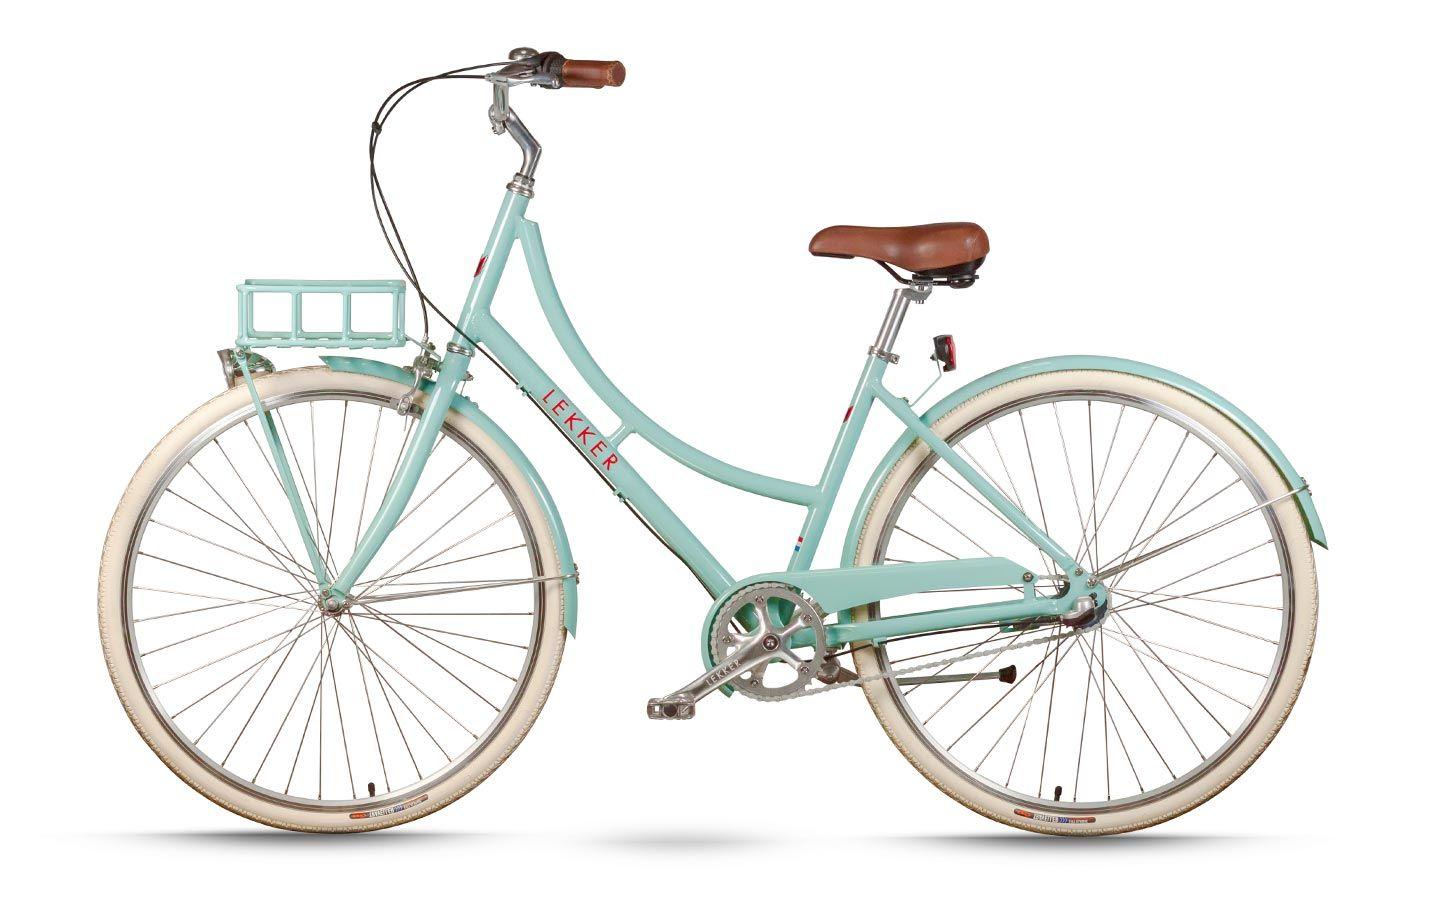 Lekker Sportief Womens Bike Pastel Blue Vintage Bikes Retro